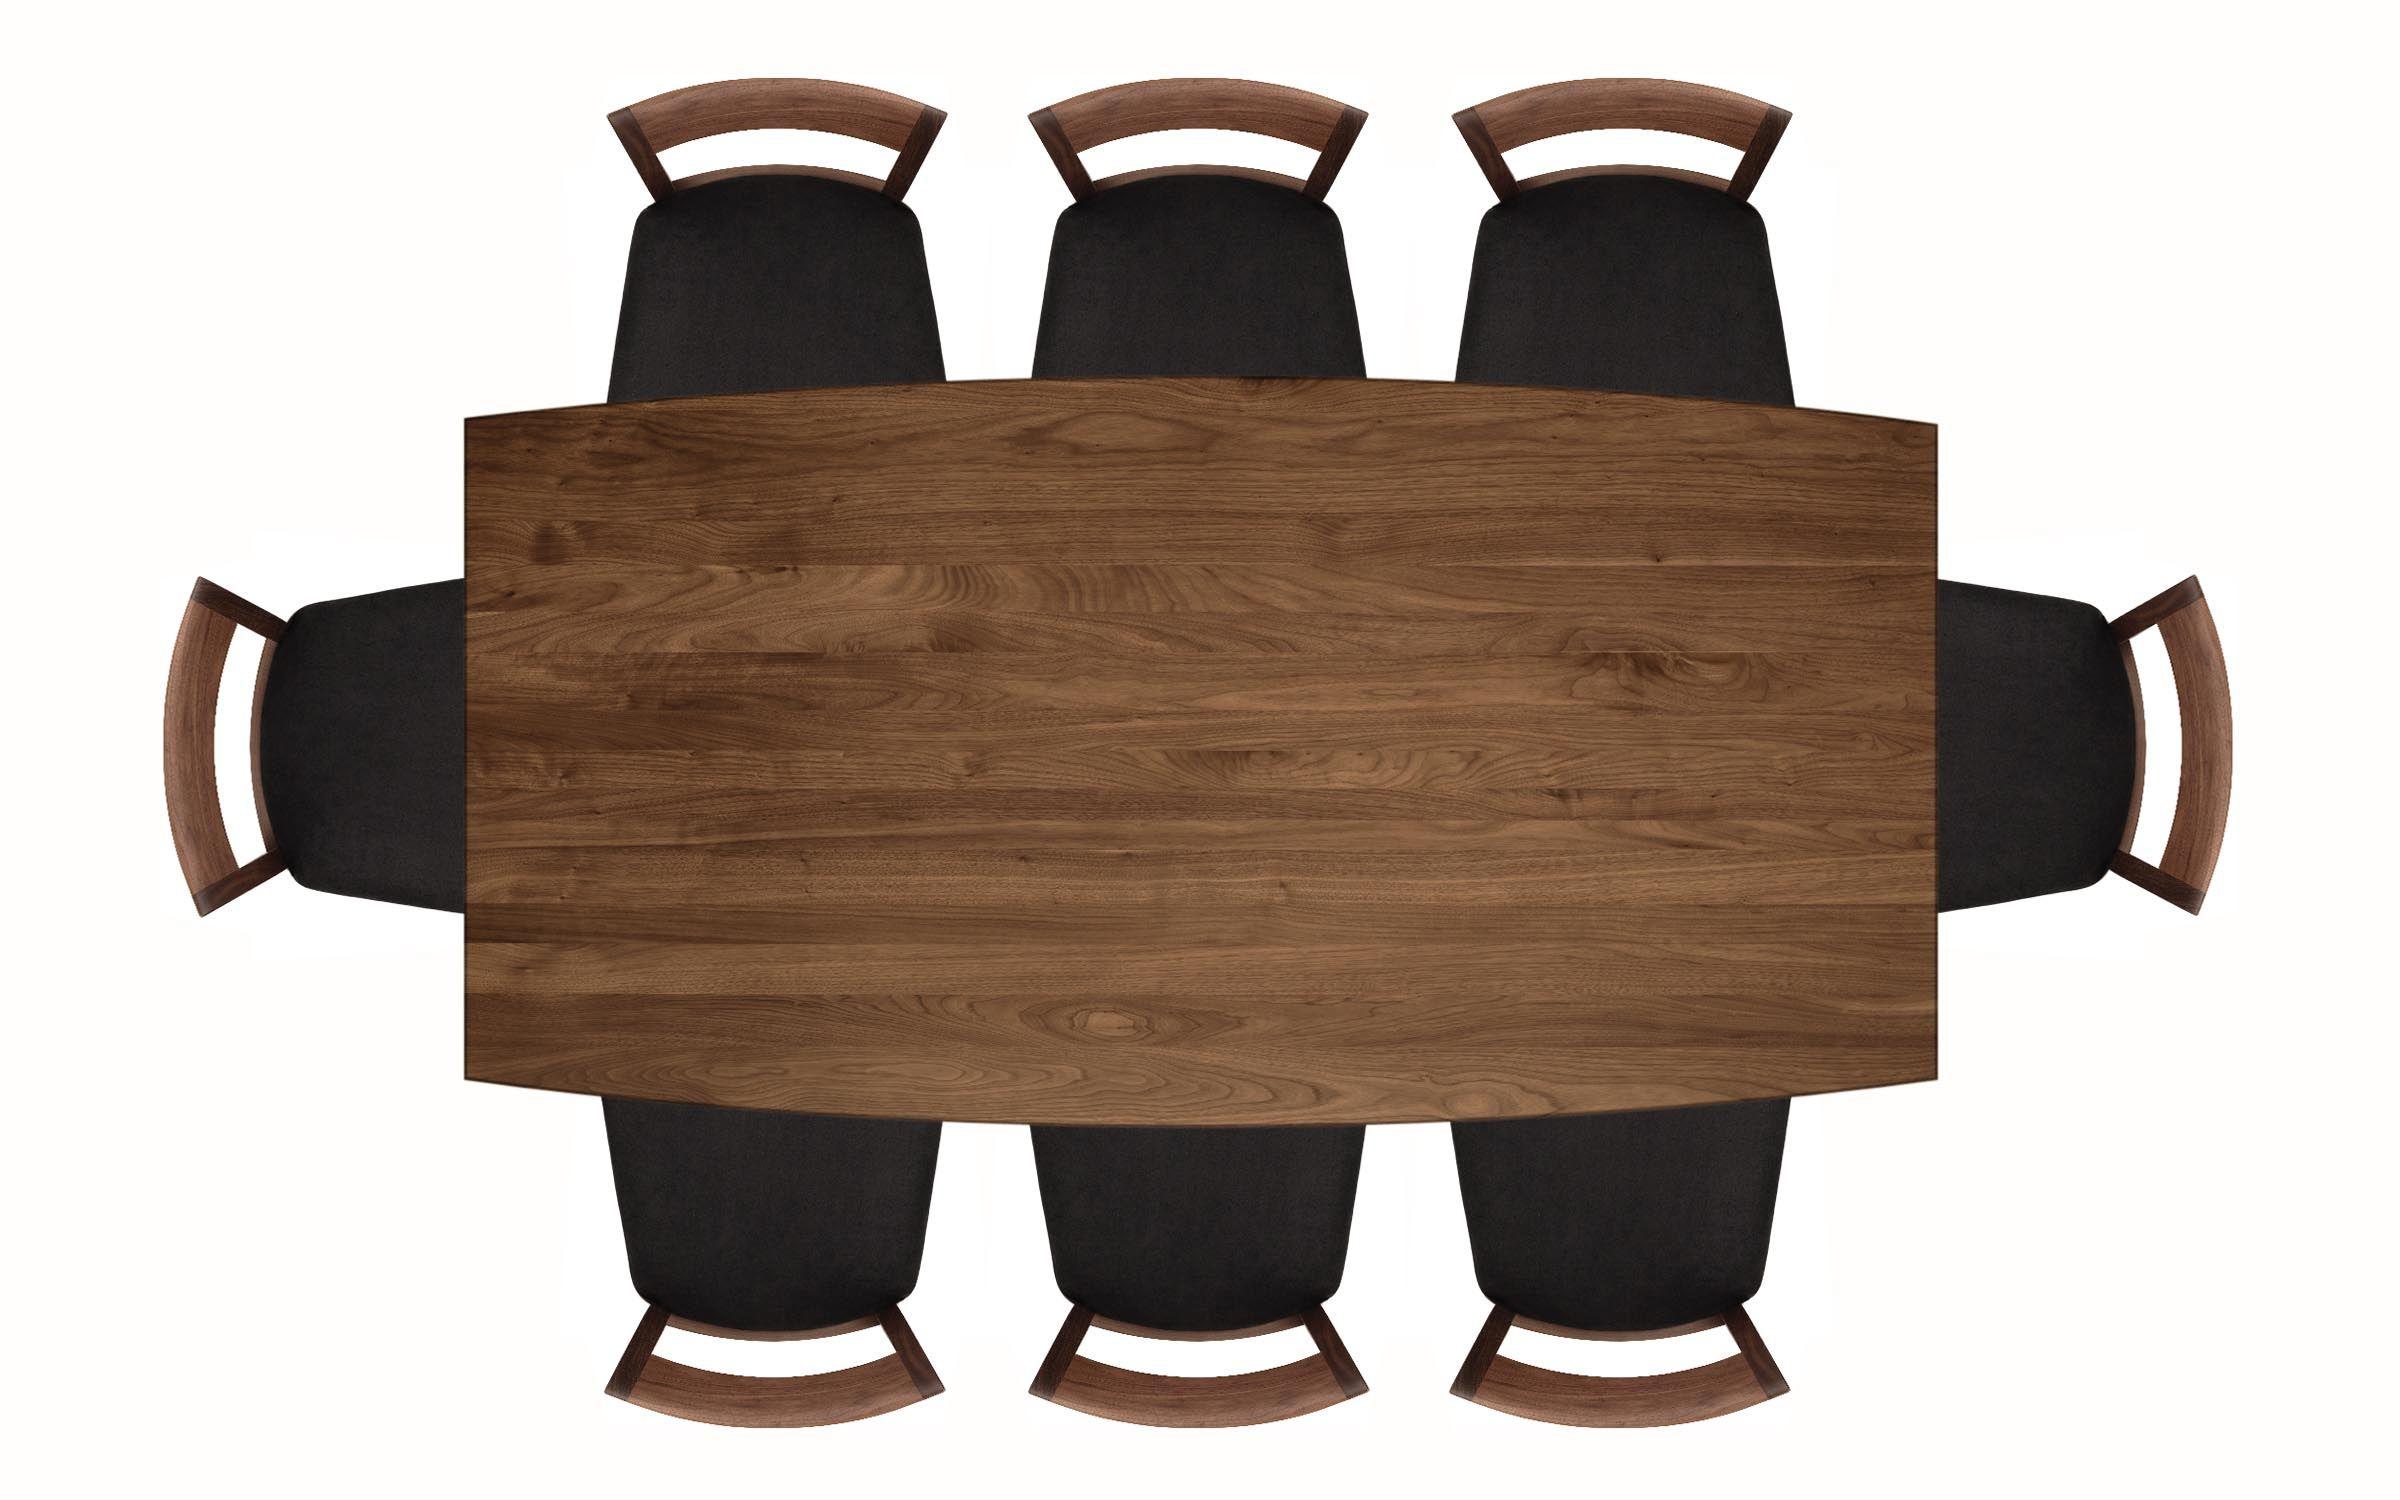 desk chair plan view incontinence protectors table top houses box desaign design